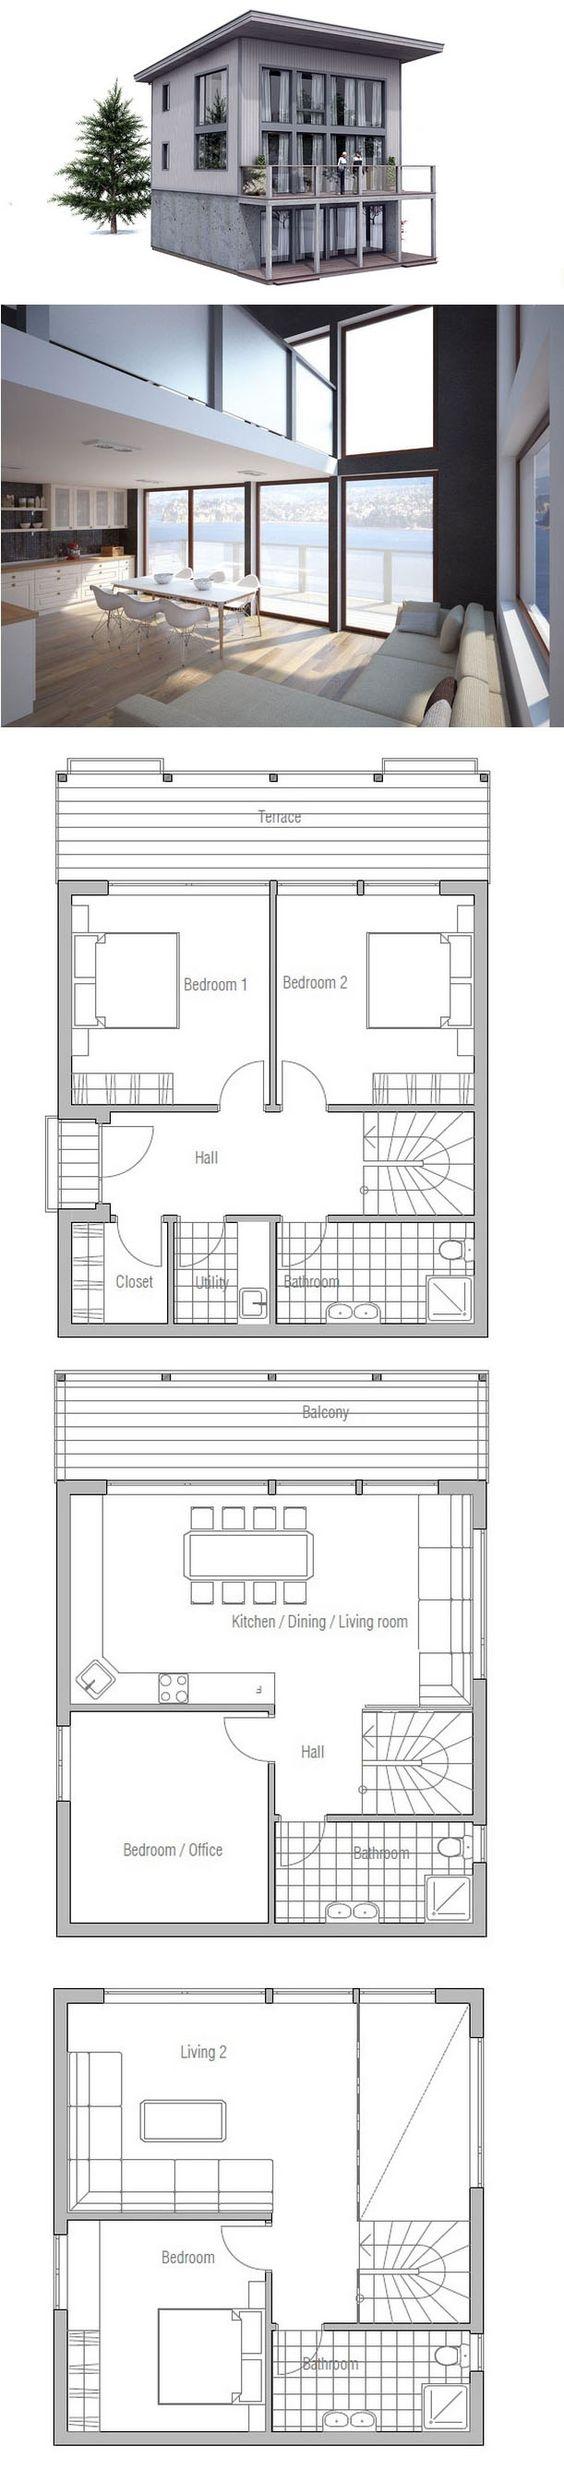 Sensational Small House Plan To Tiny Lot Philipsburg Ideas Pinterest Largest Home Design Picture Inspirations Pitcheantrous